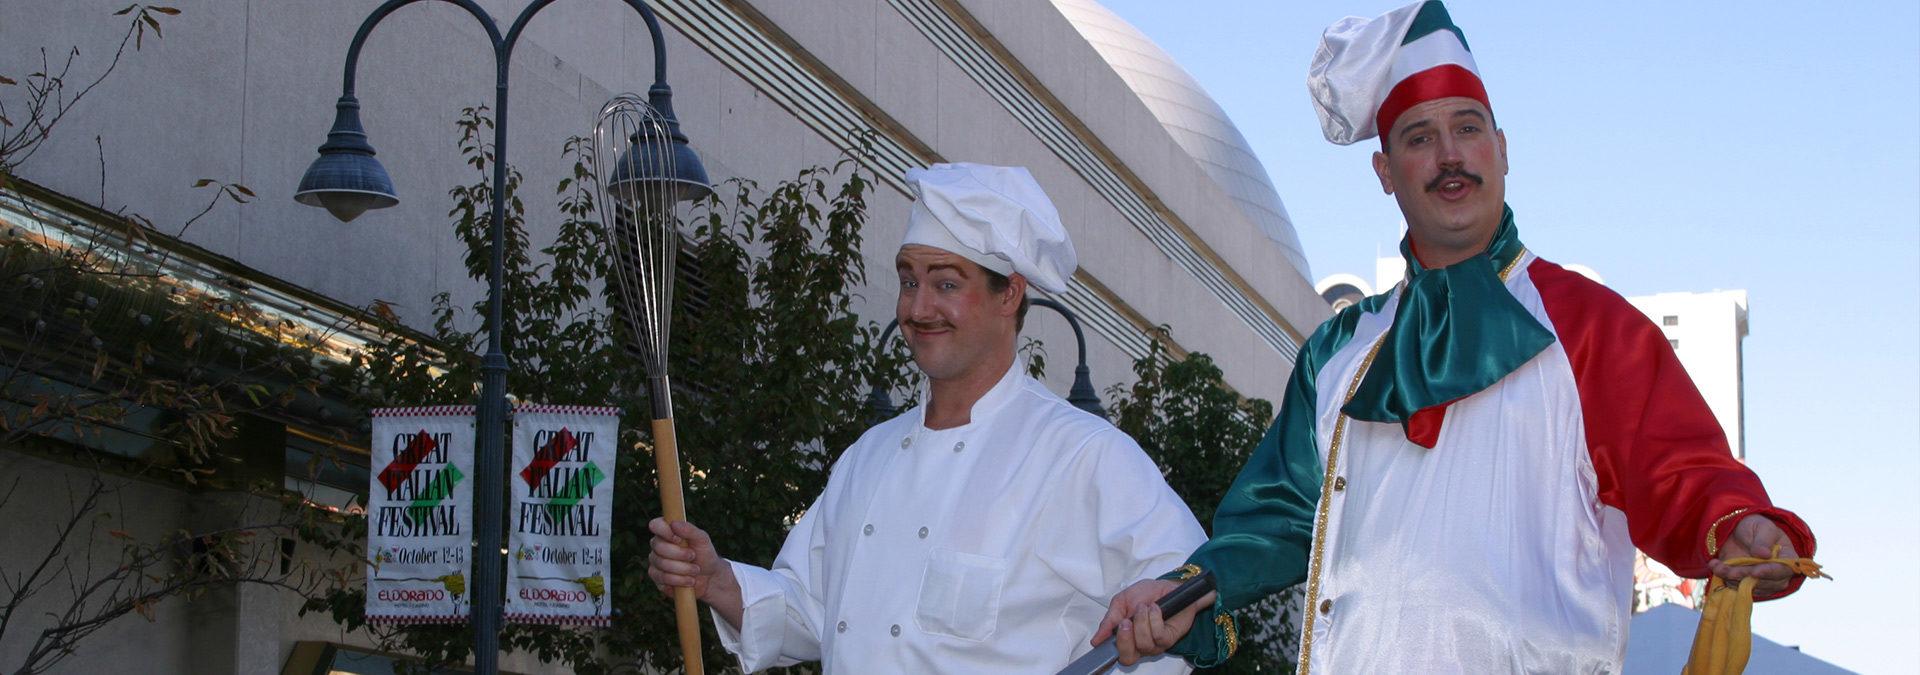 The Eldorado Great Italian Festival & Italian Festival Reno